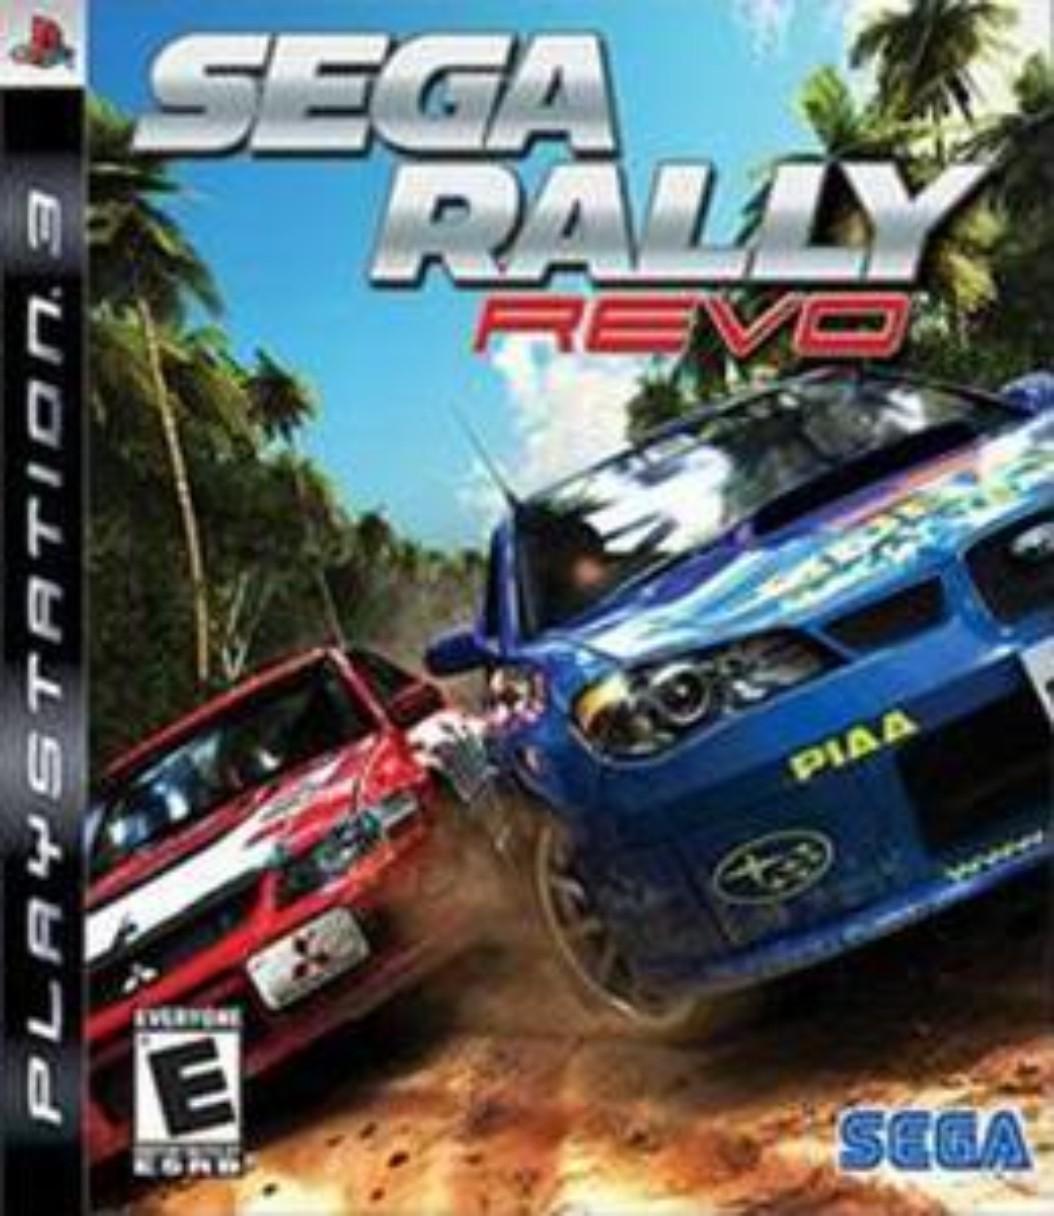 Sega rally Iso